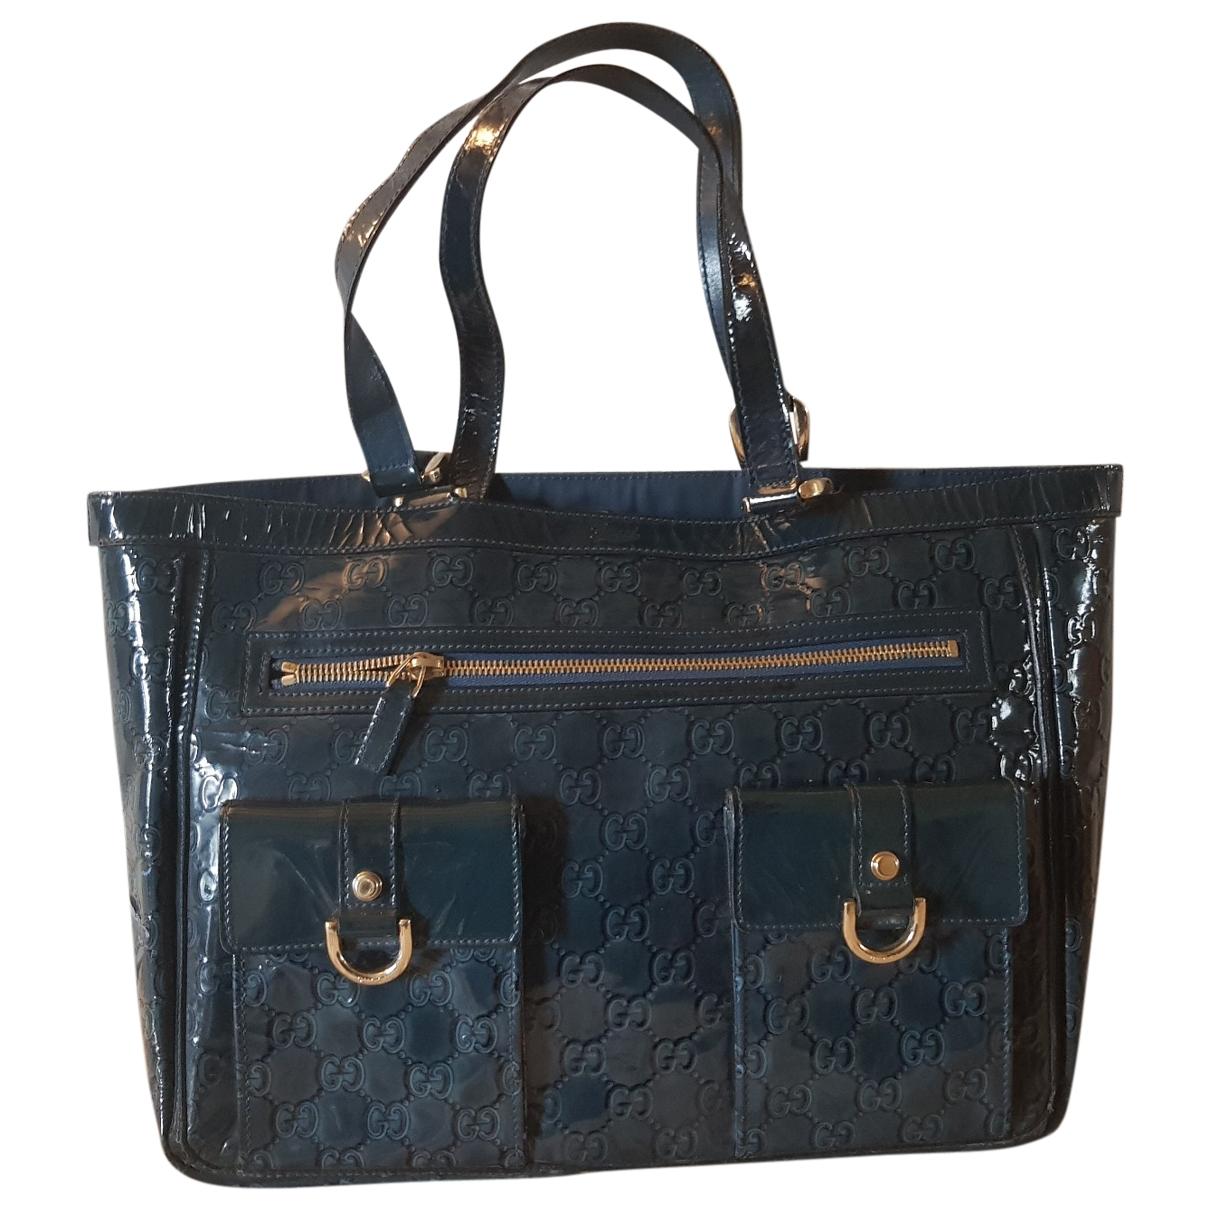 Gucci \N Blue Patent leather handbag for Women \N